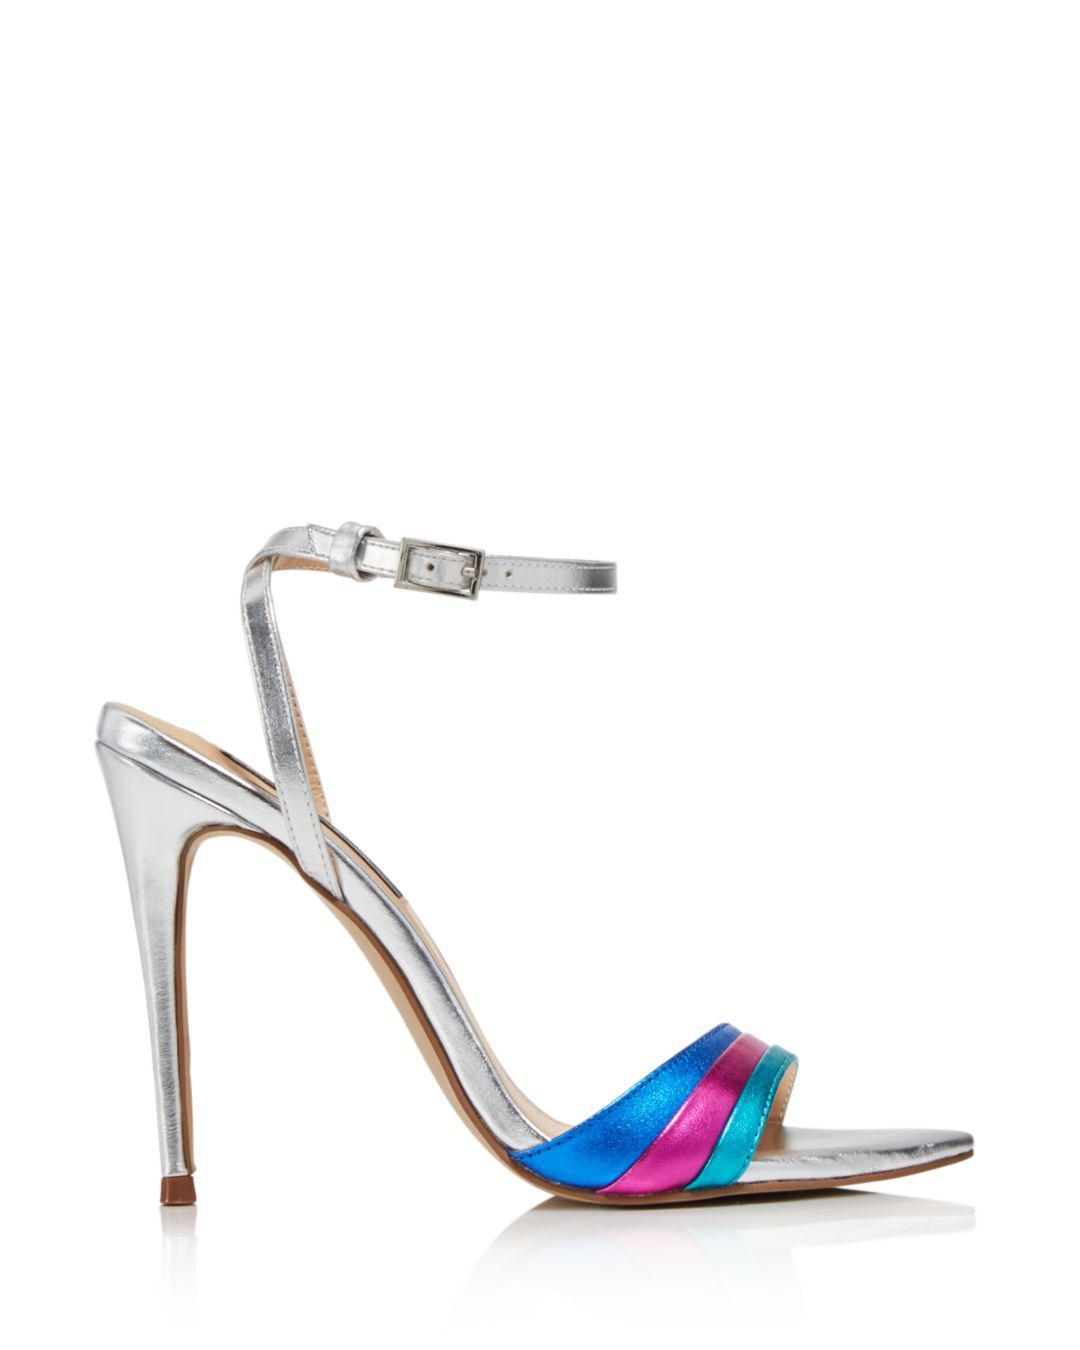 7ba70cd349d Lyst - Aqua Women s Kiki Rainbow High-heel Sandals in Blue